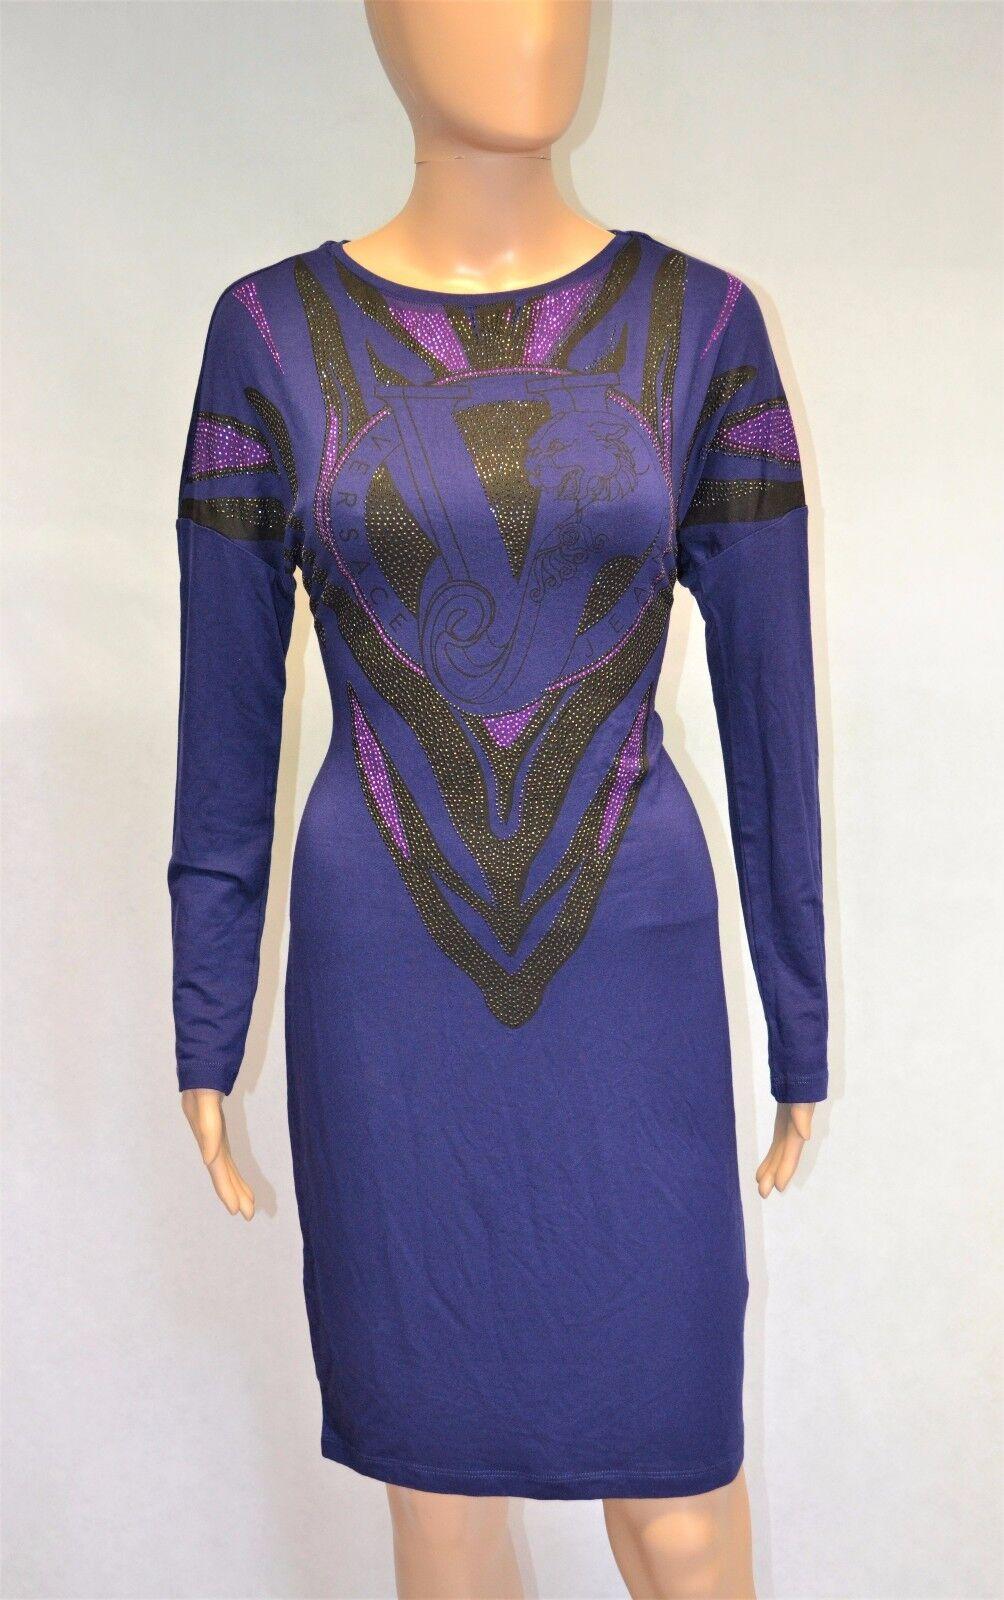 BNWT VERSACE JEANS NAVY Blau lila STUDDED RHINESTONE STRETCH DRESS VJ TIGER